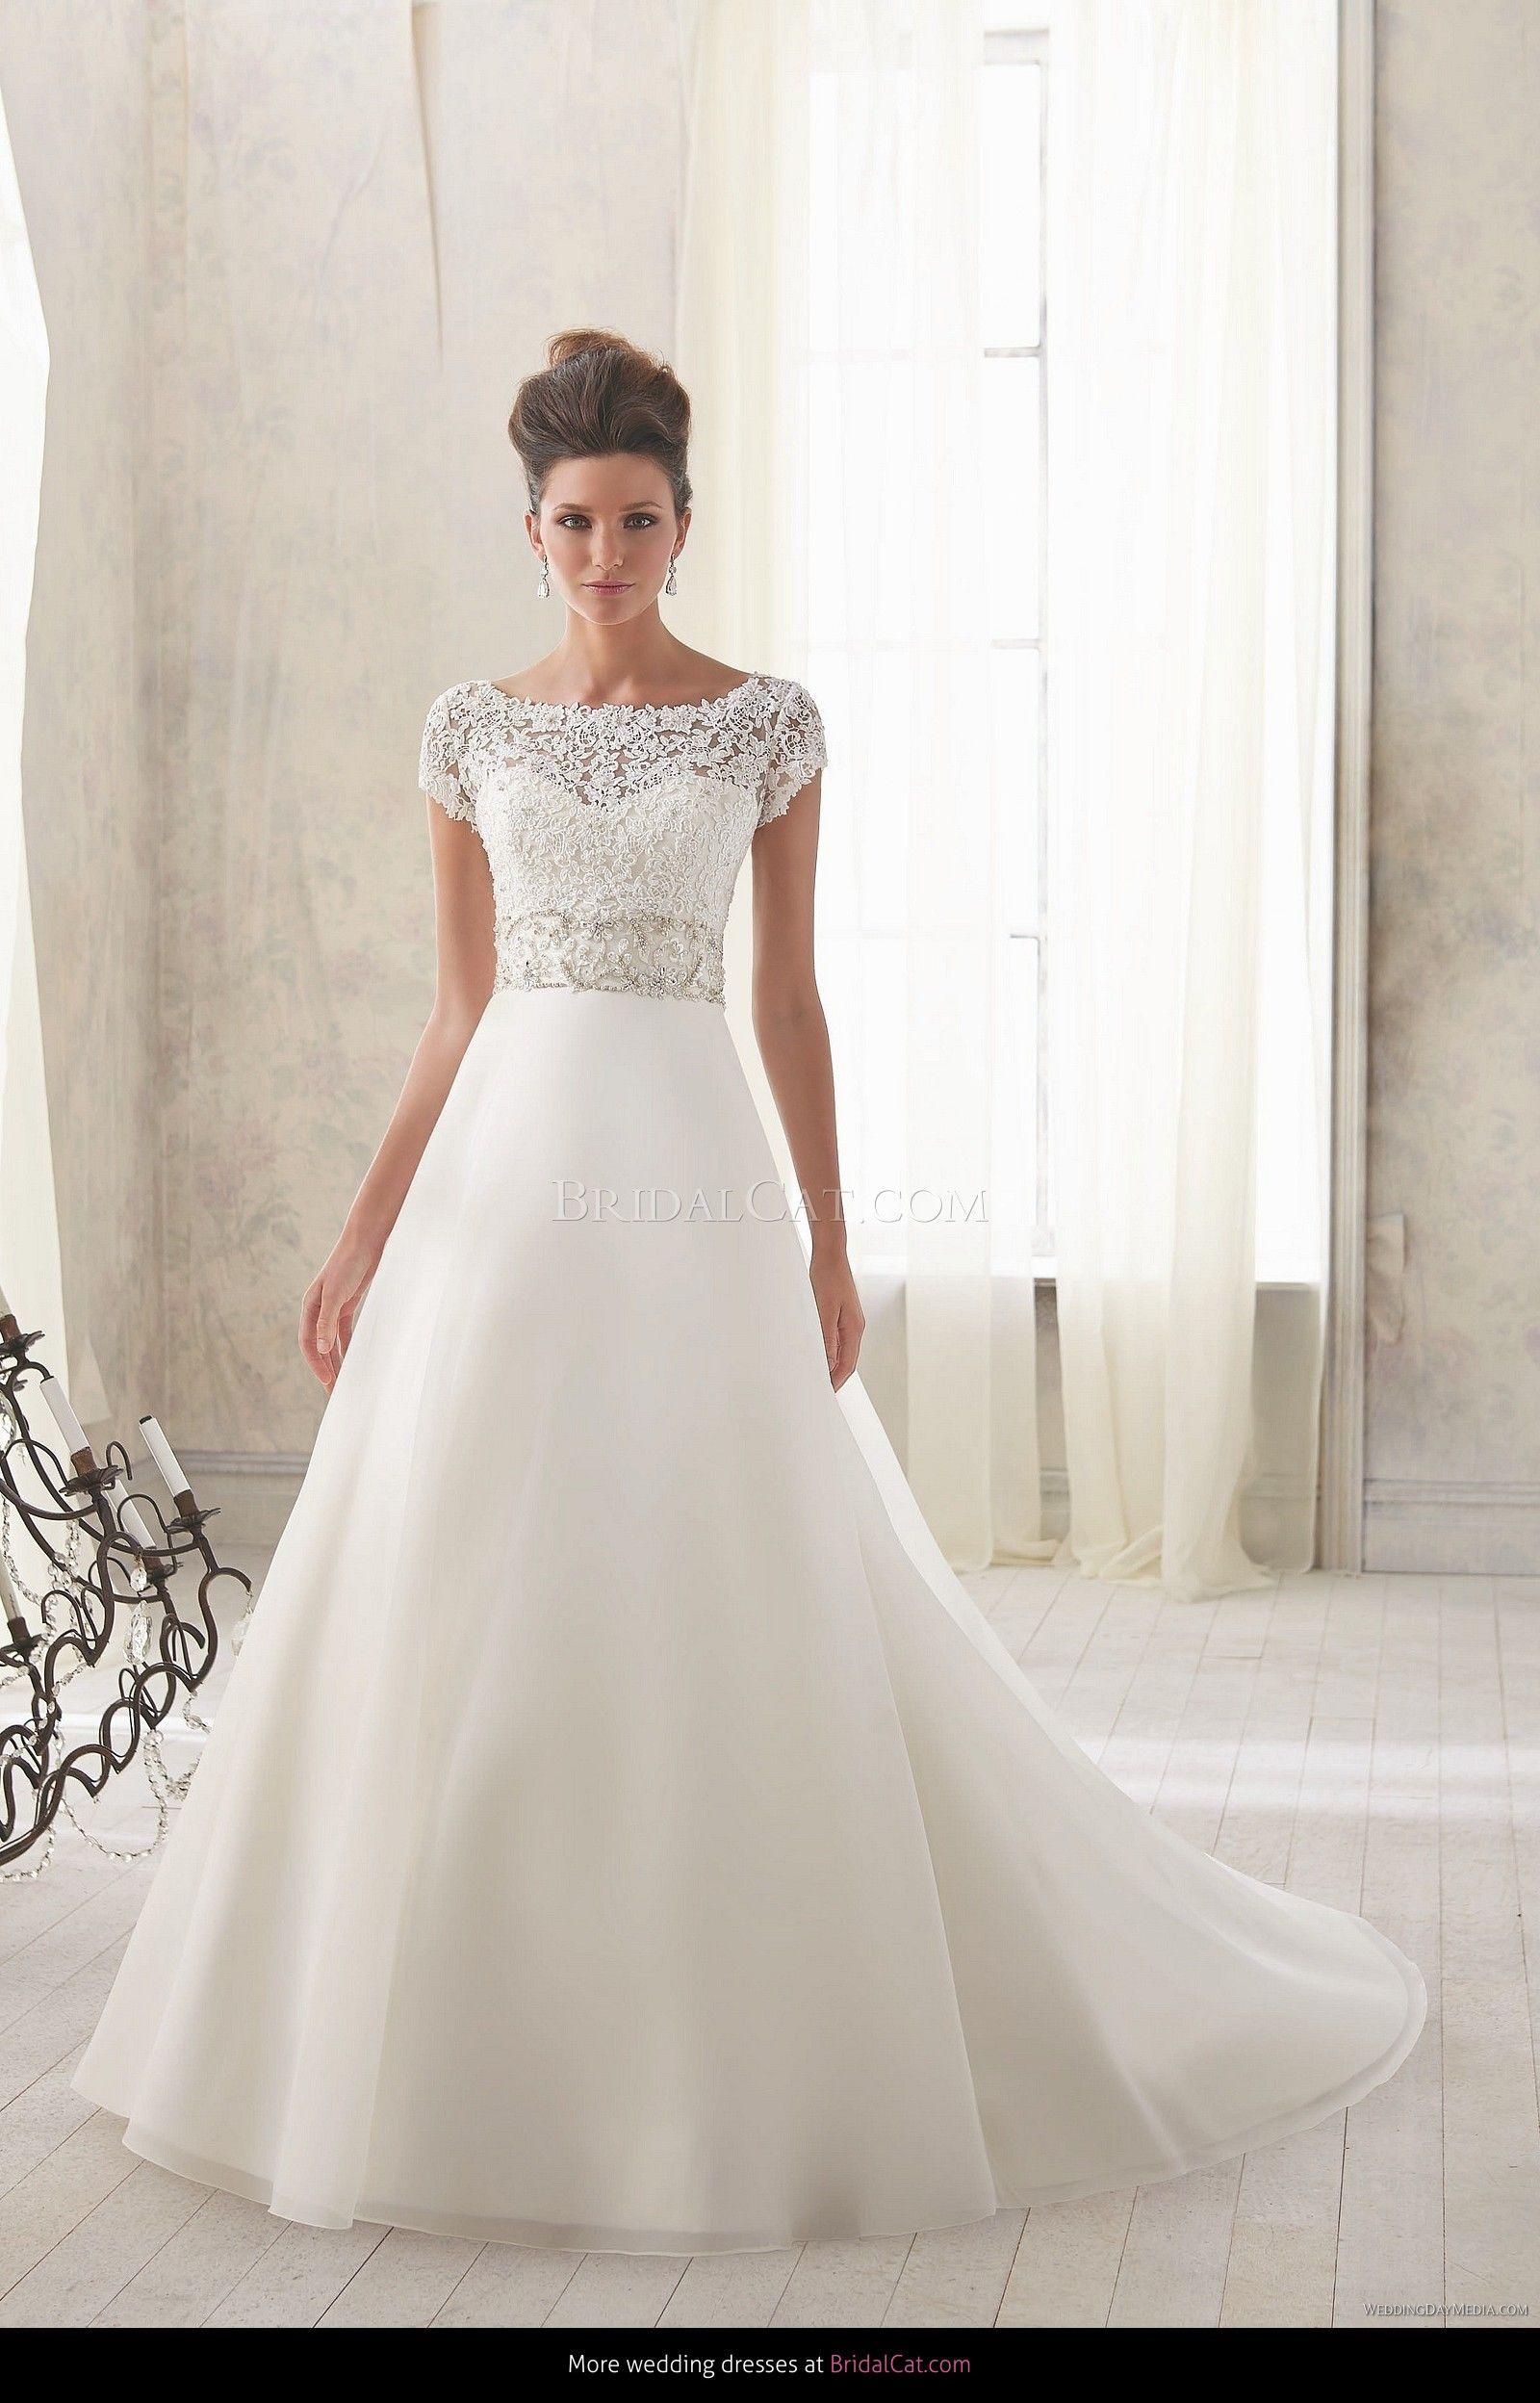 La sposa pandora wedding dress  eveline viaene evelineviaene on Pinterest